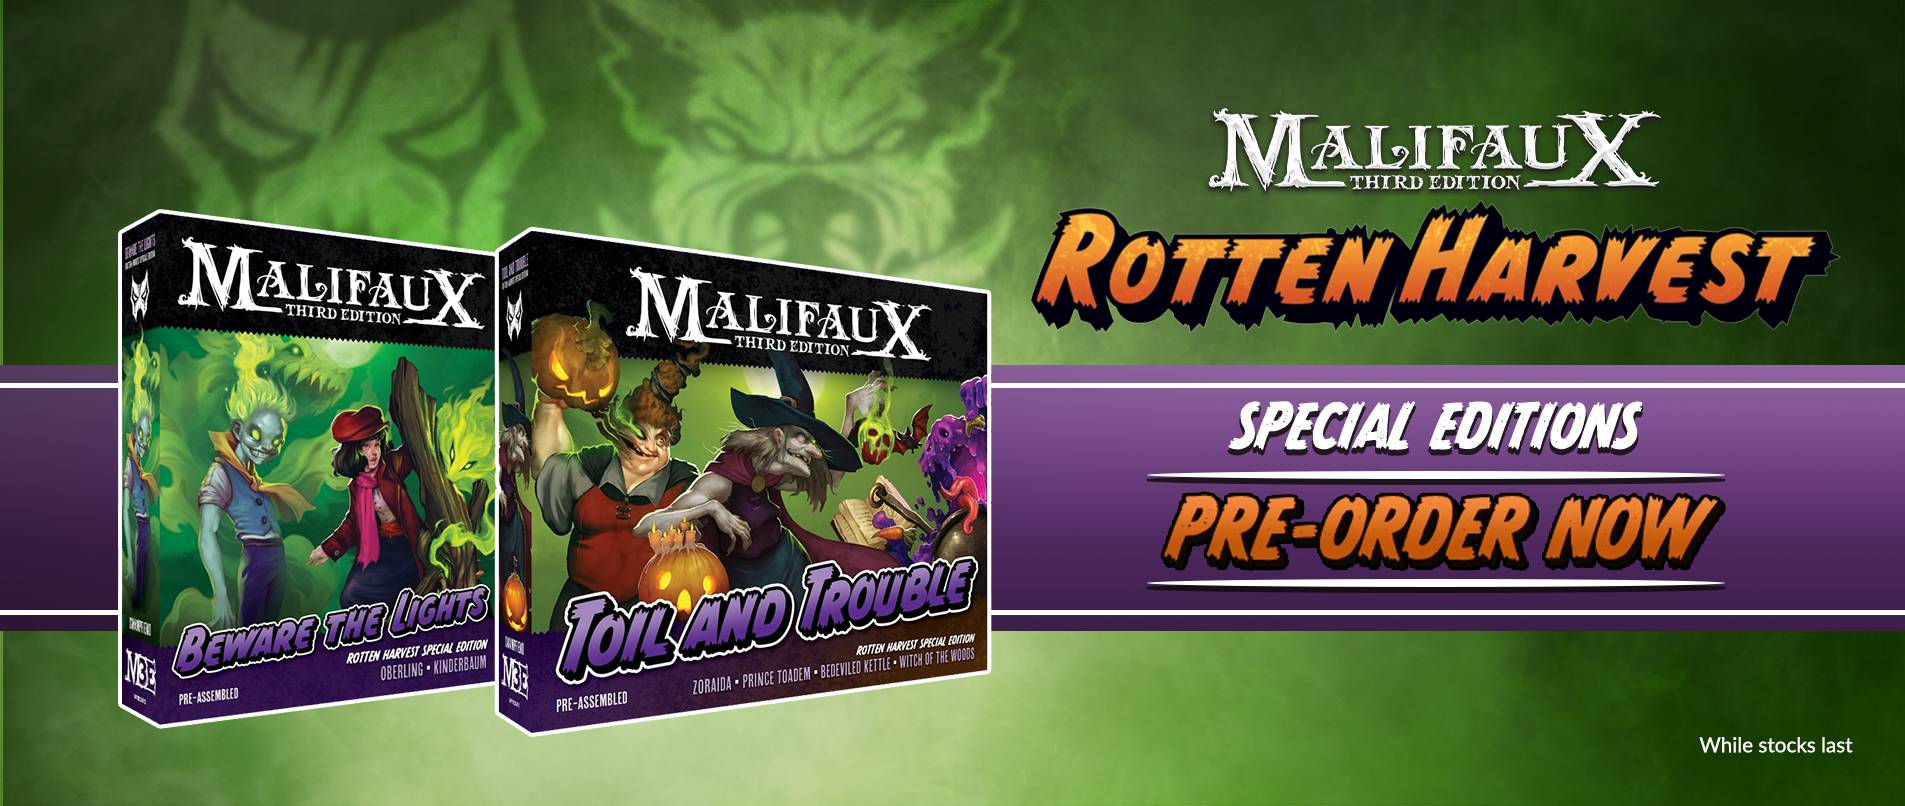 Malifaux - Rotten Harvest - Warcradle Distribution